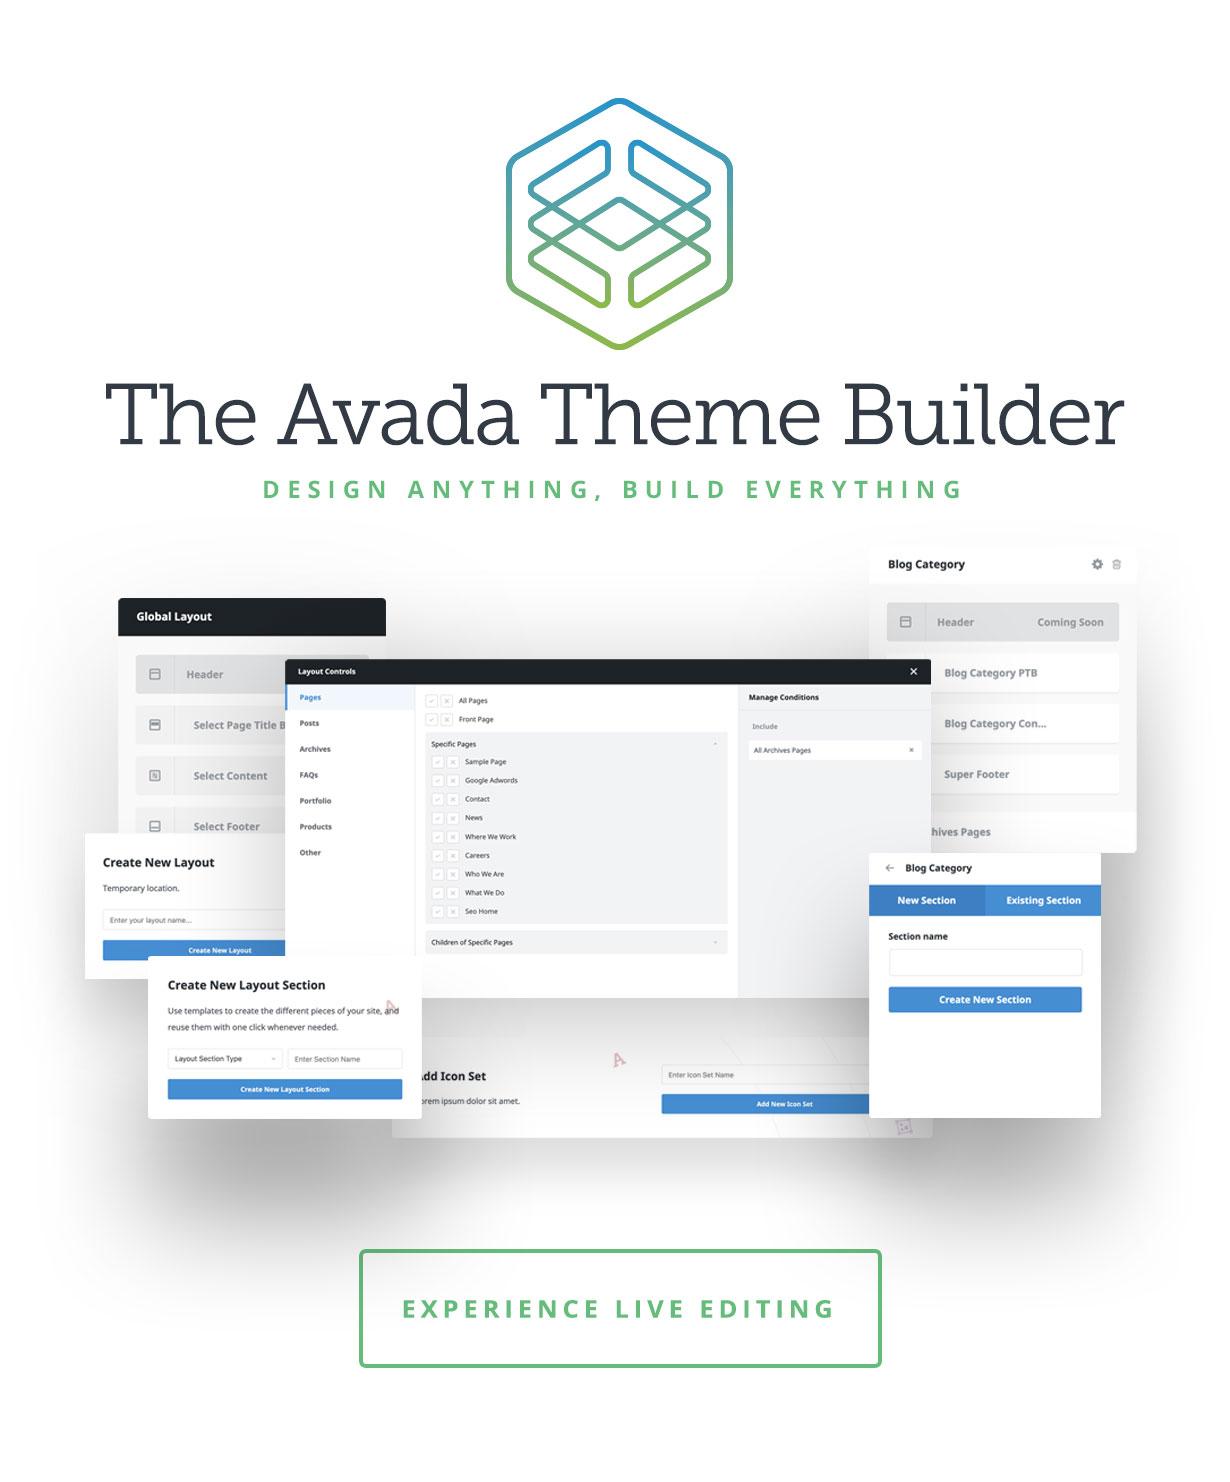 62 themebuilder itempage - Avada   Website Builder For WordPress & WooCommerce